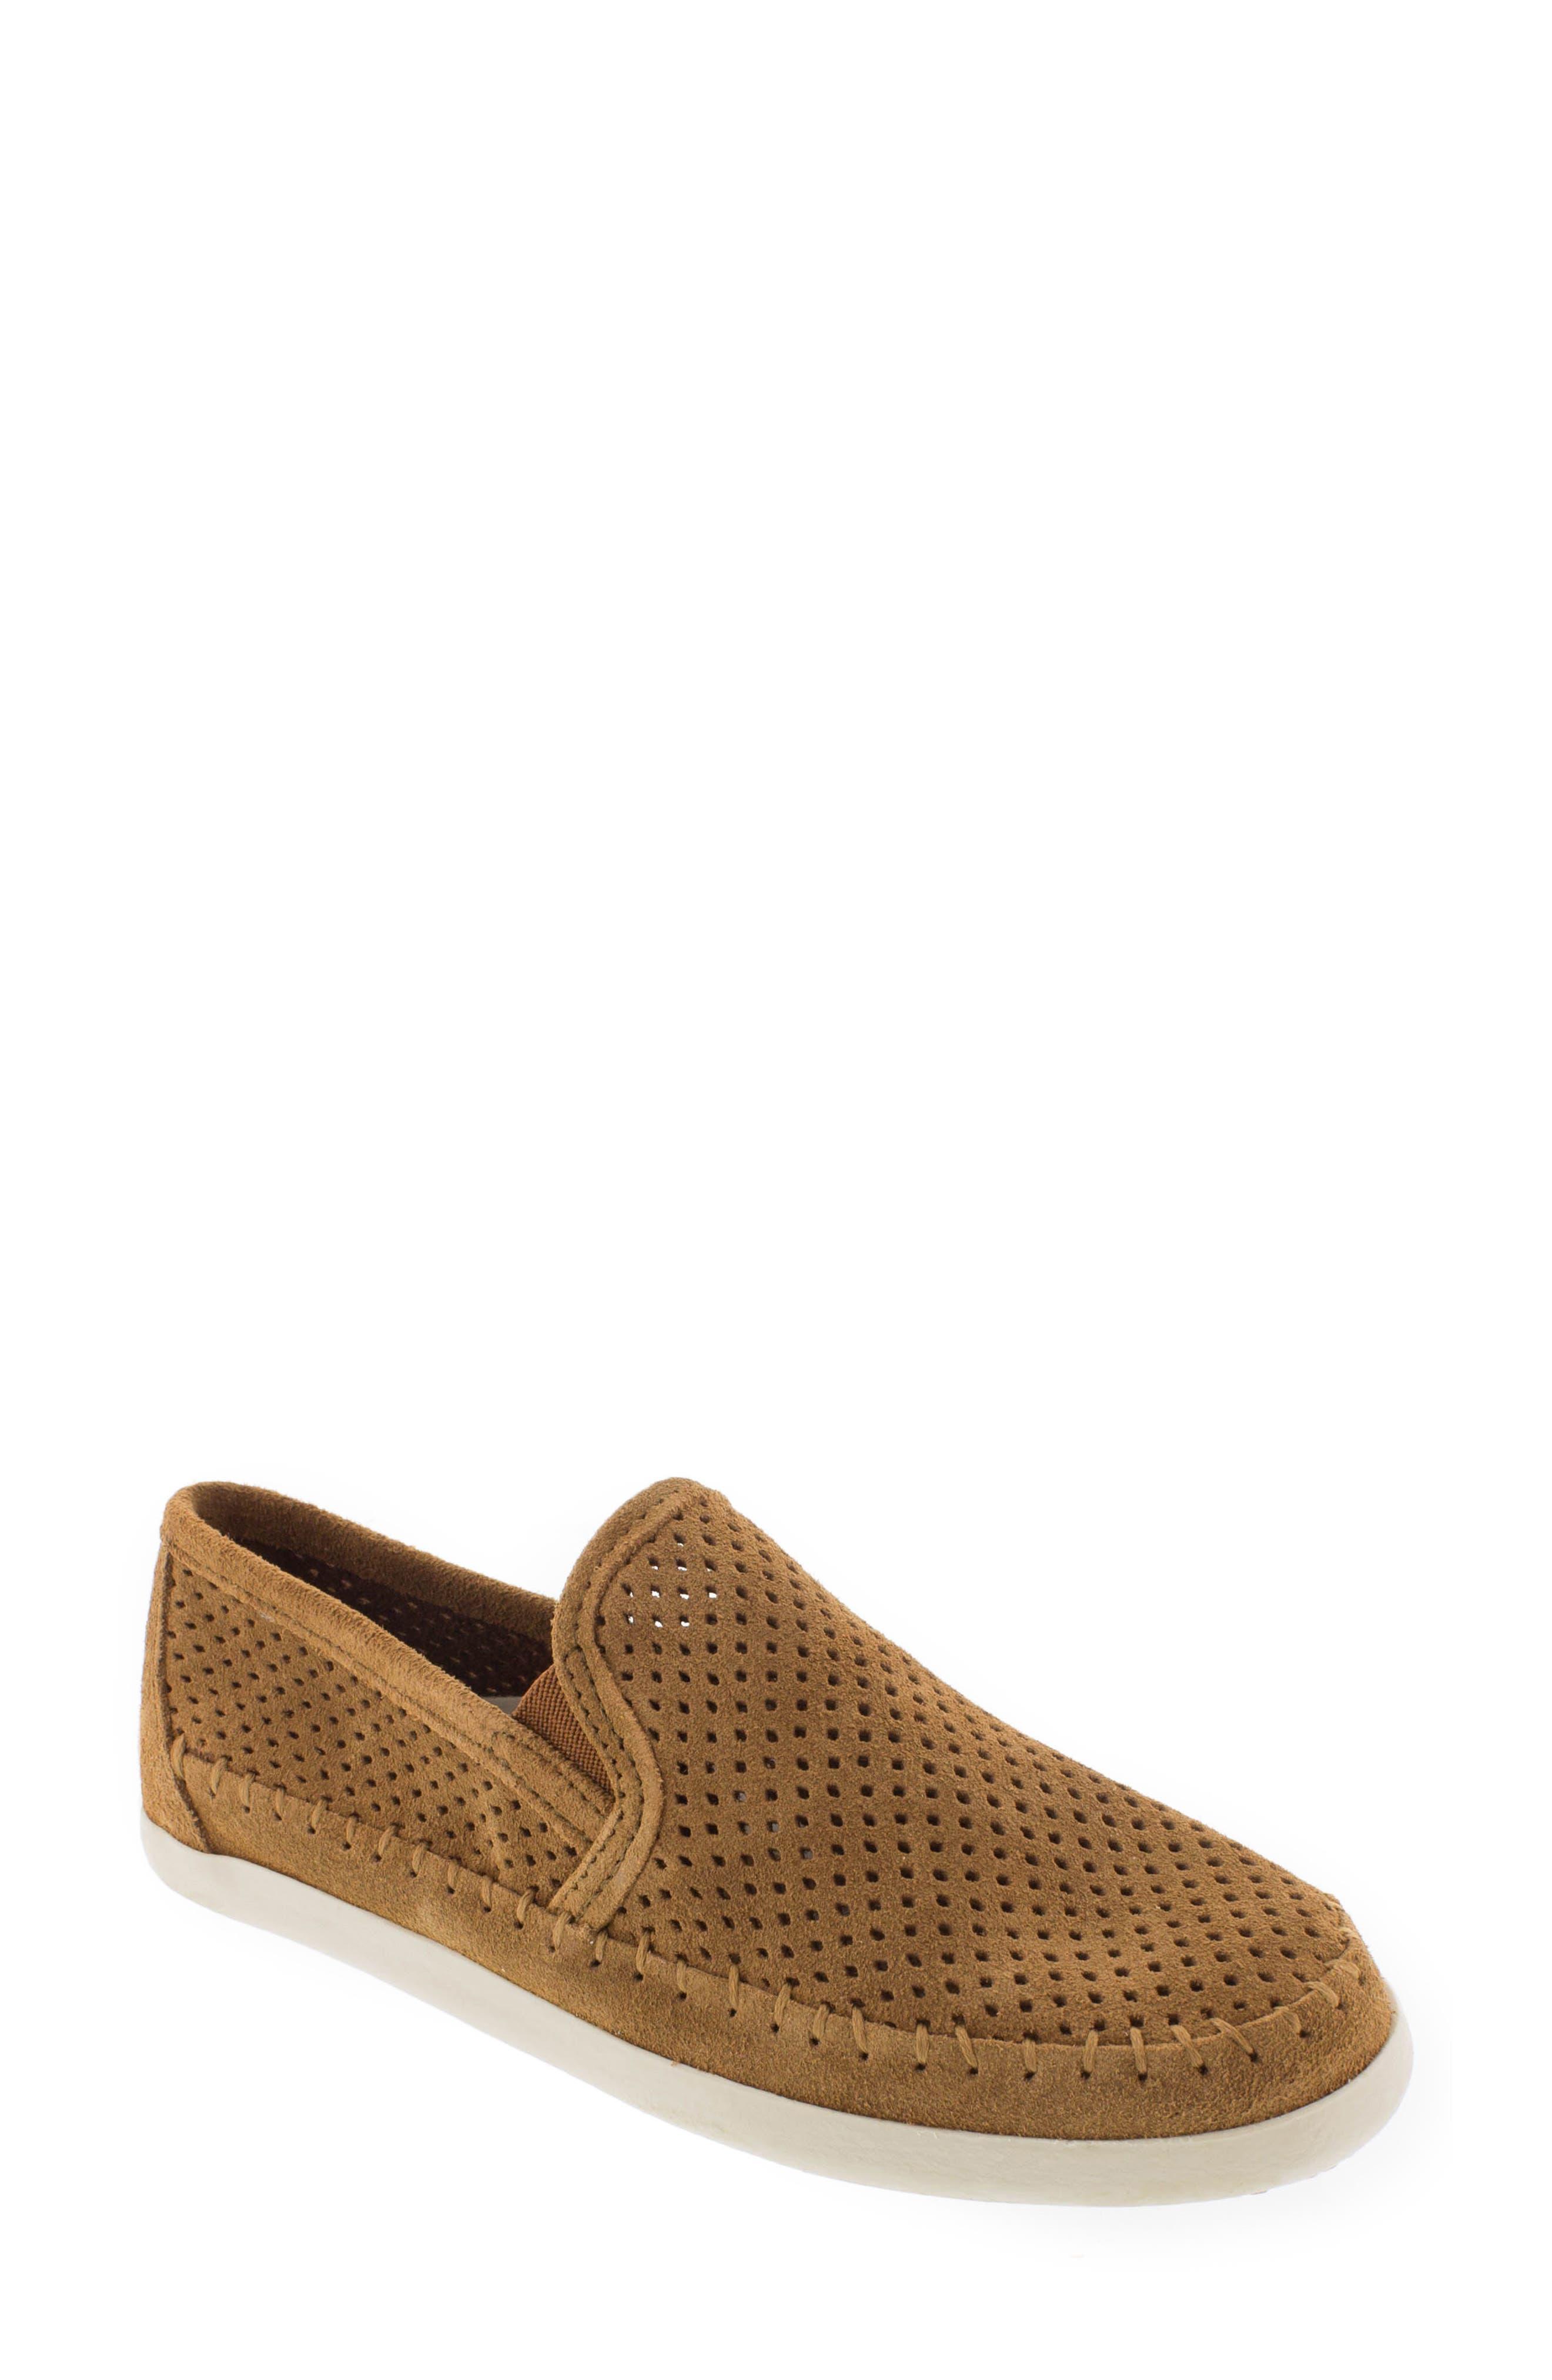 MINNETONKA Pacific Slip-On Sneaker